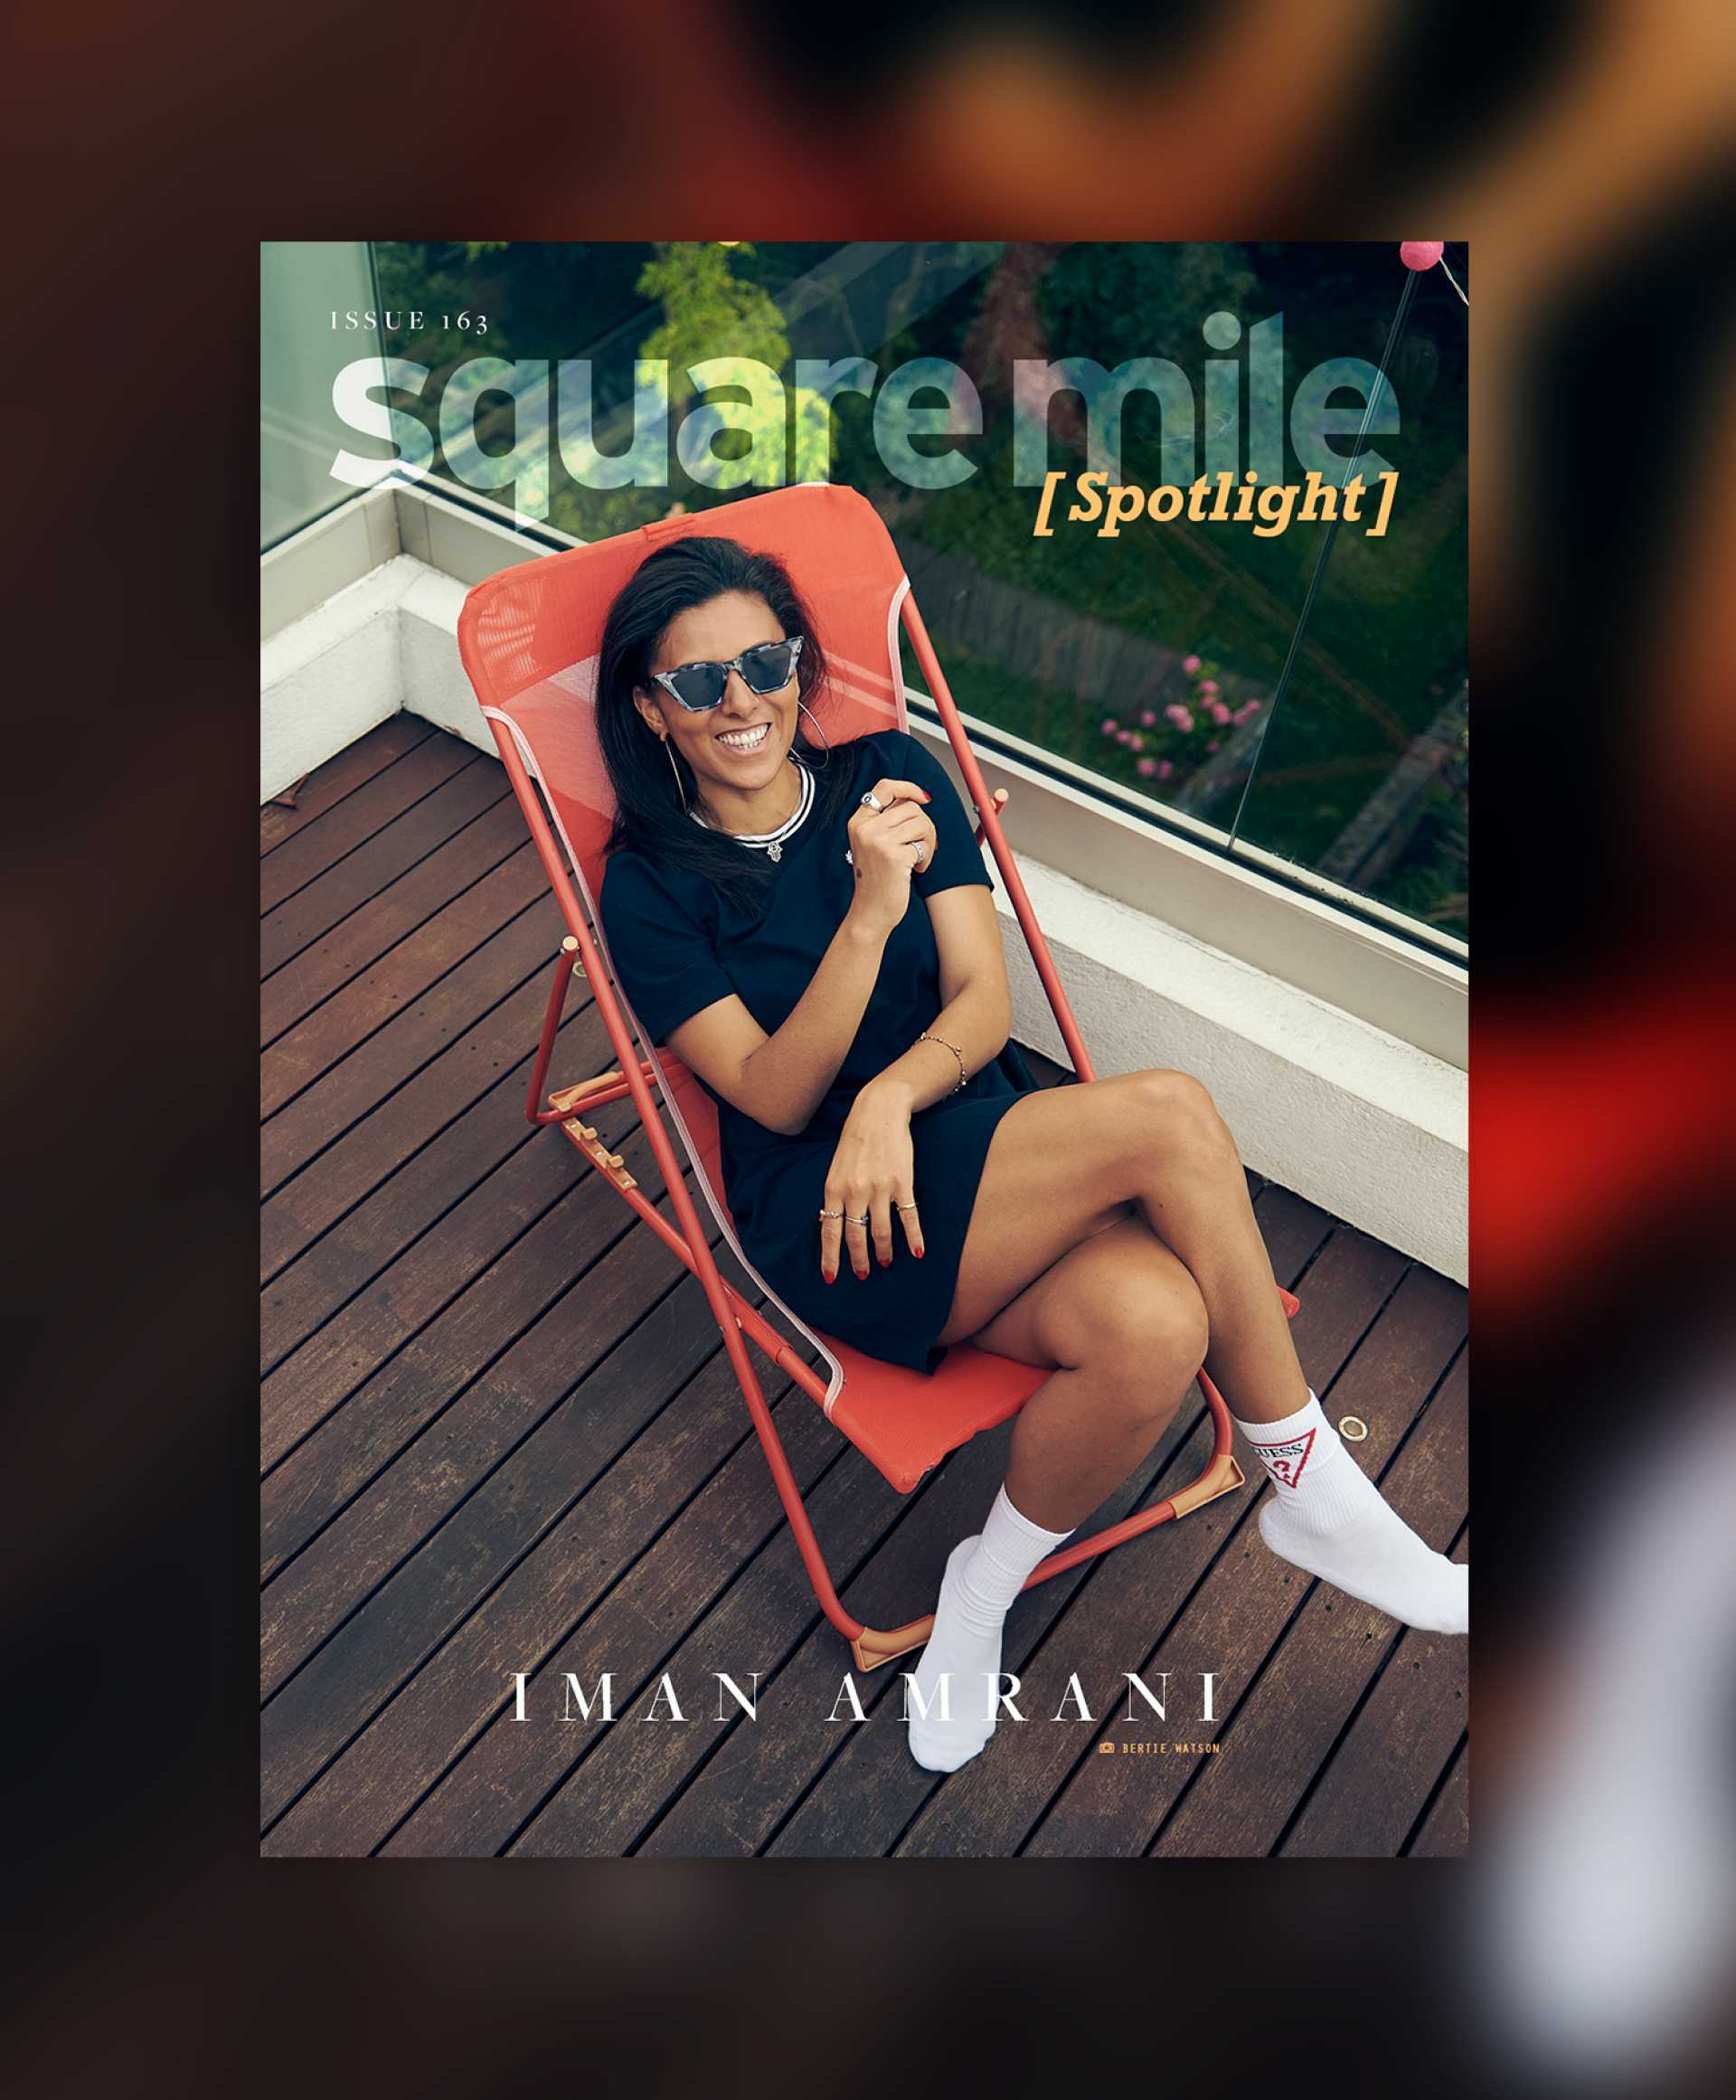 Iman Amrani for Square Mile magazine